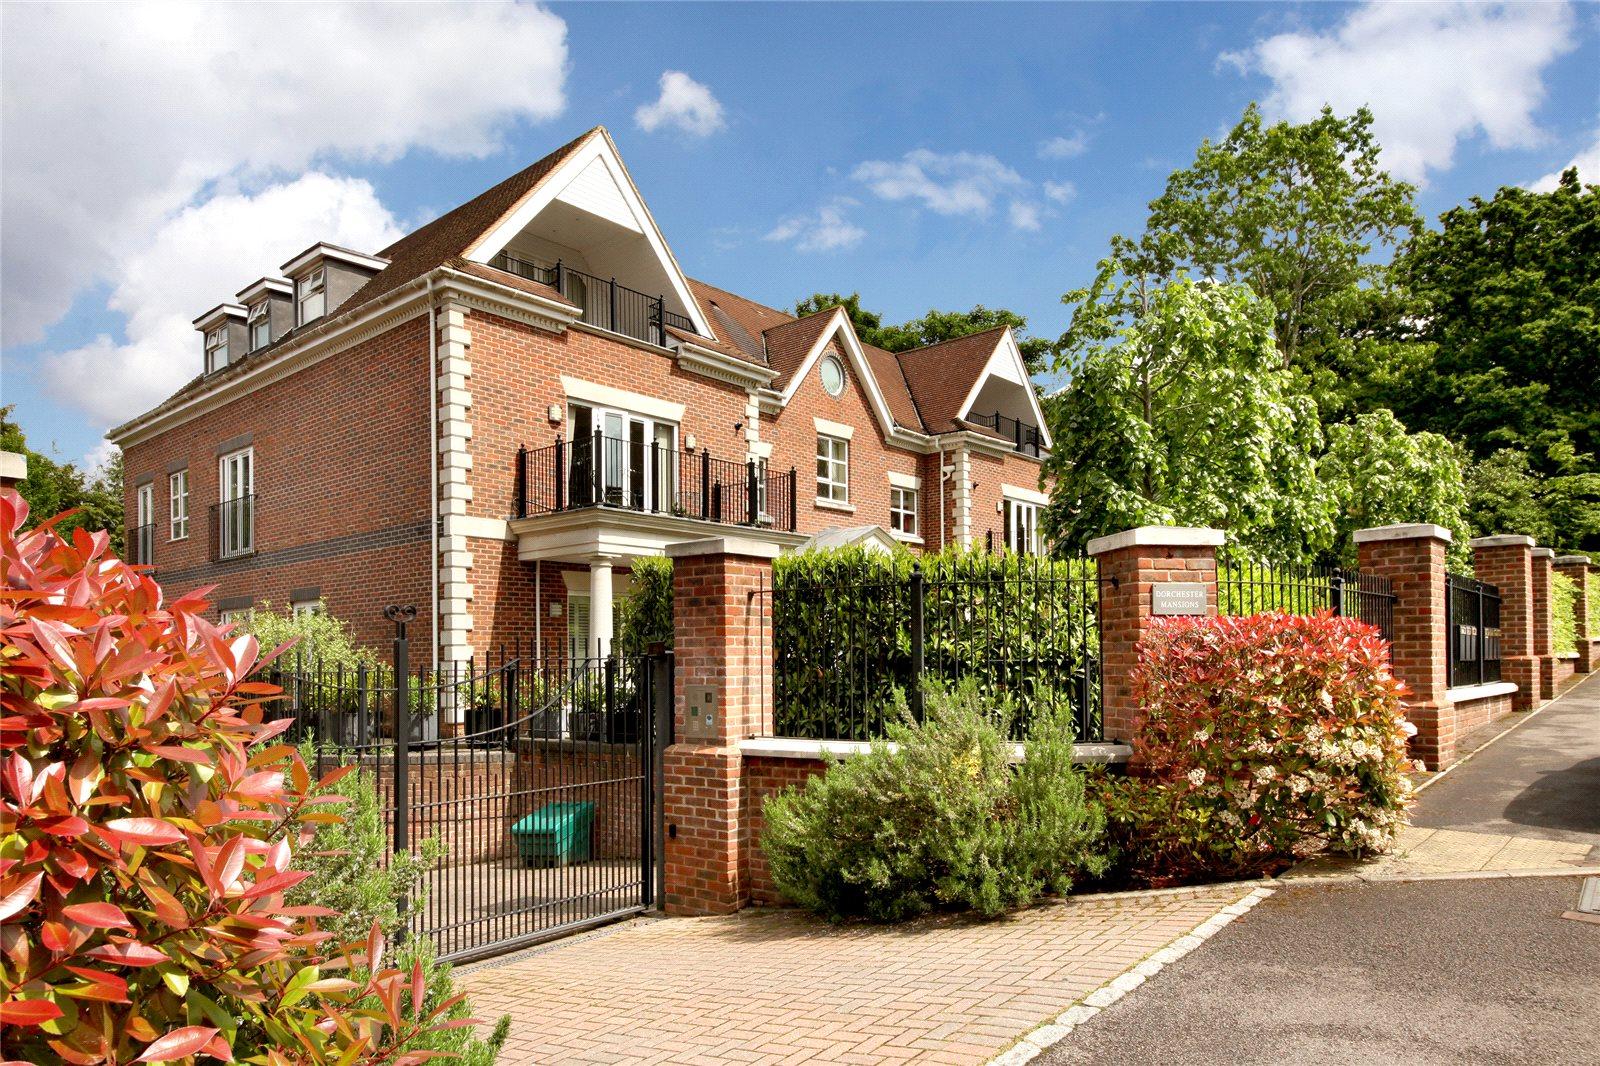 Dorchester Mansions, Cross Road, Sunningdale, Berkshire, SL5 Sunningdale, England